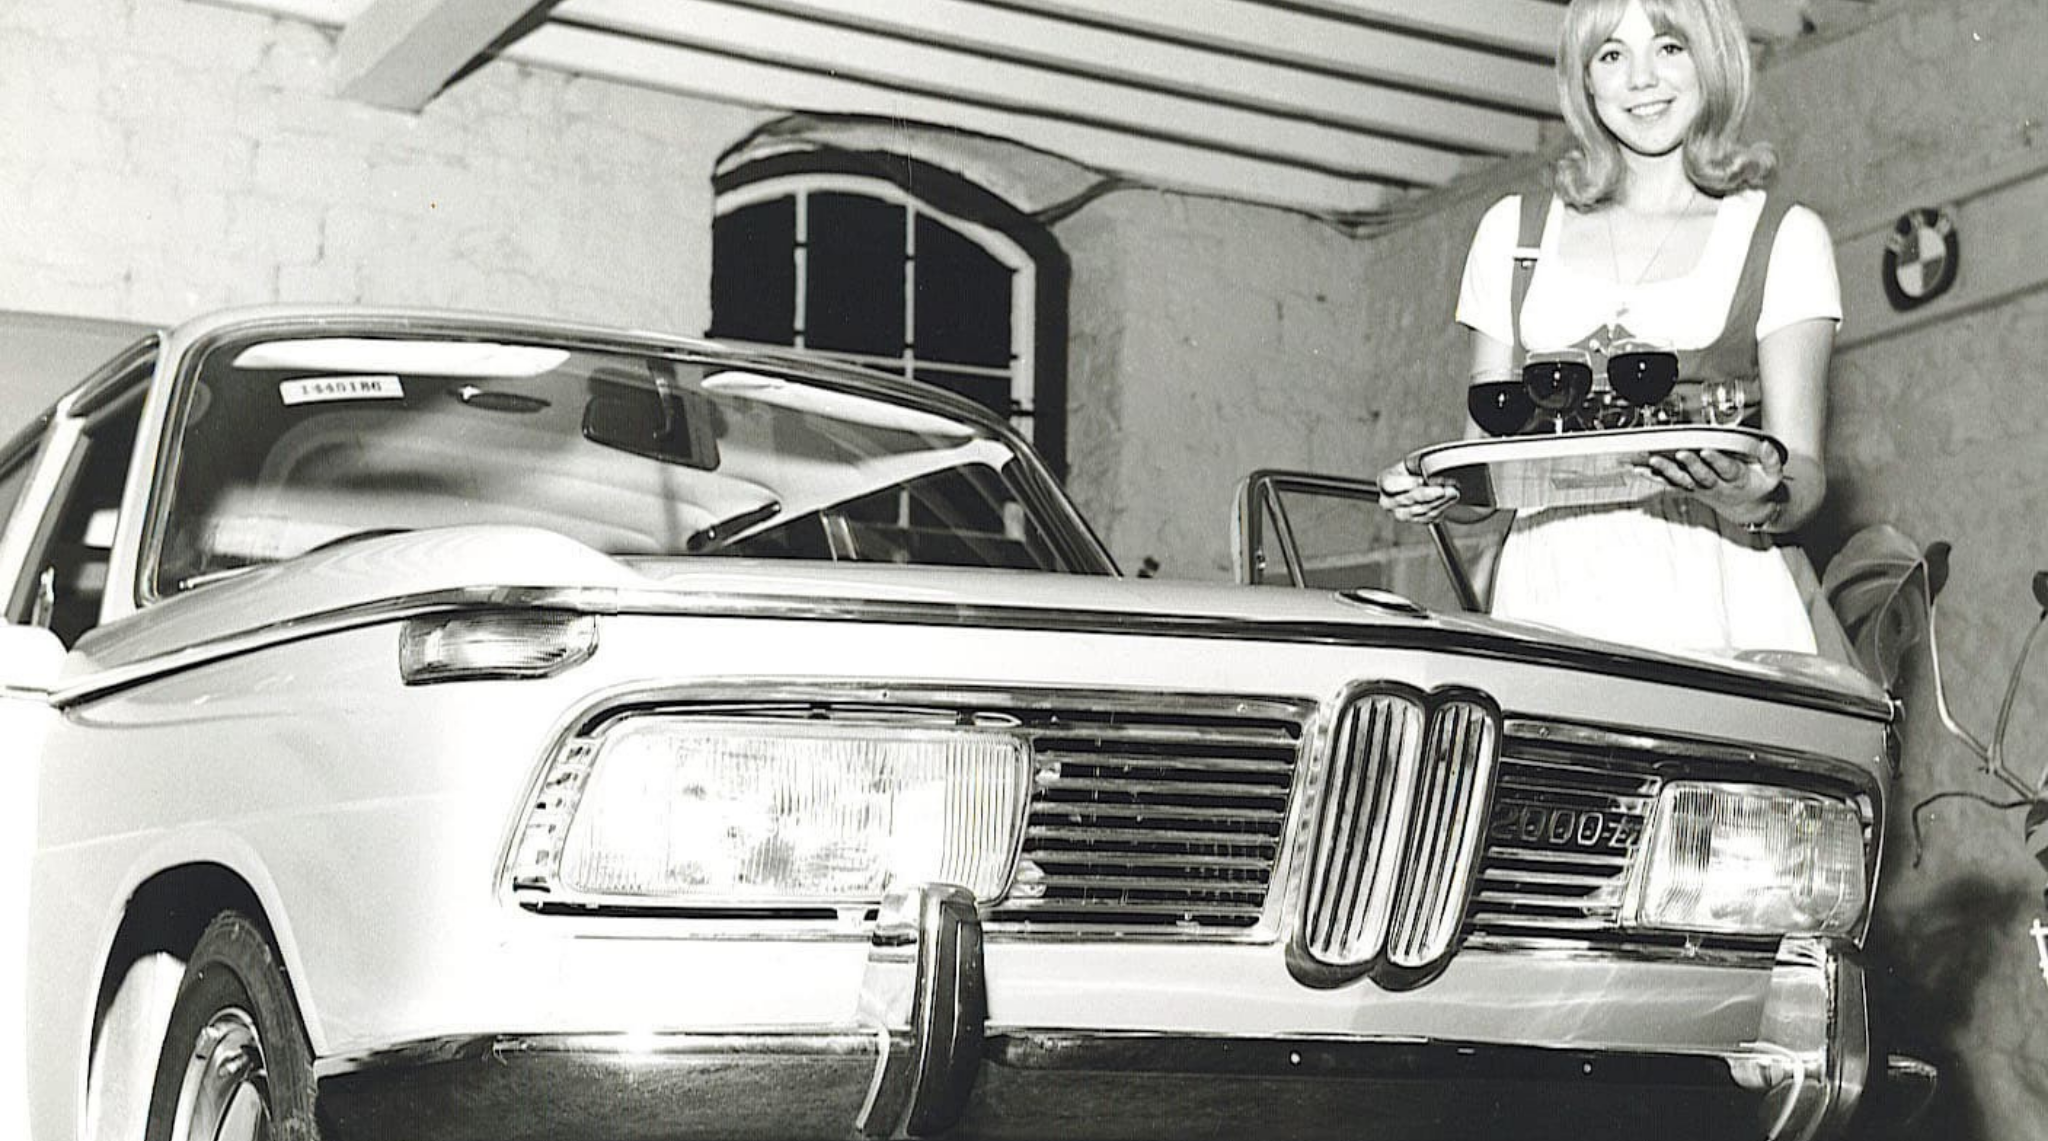 Dick Lovett BMW 2